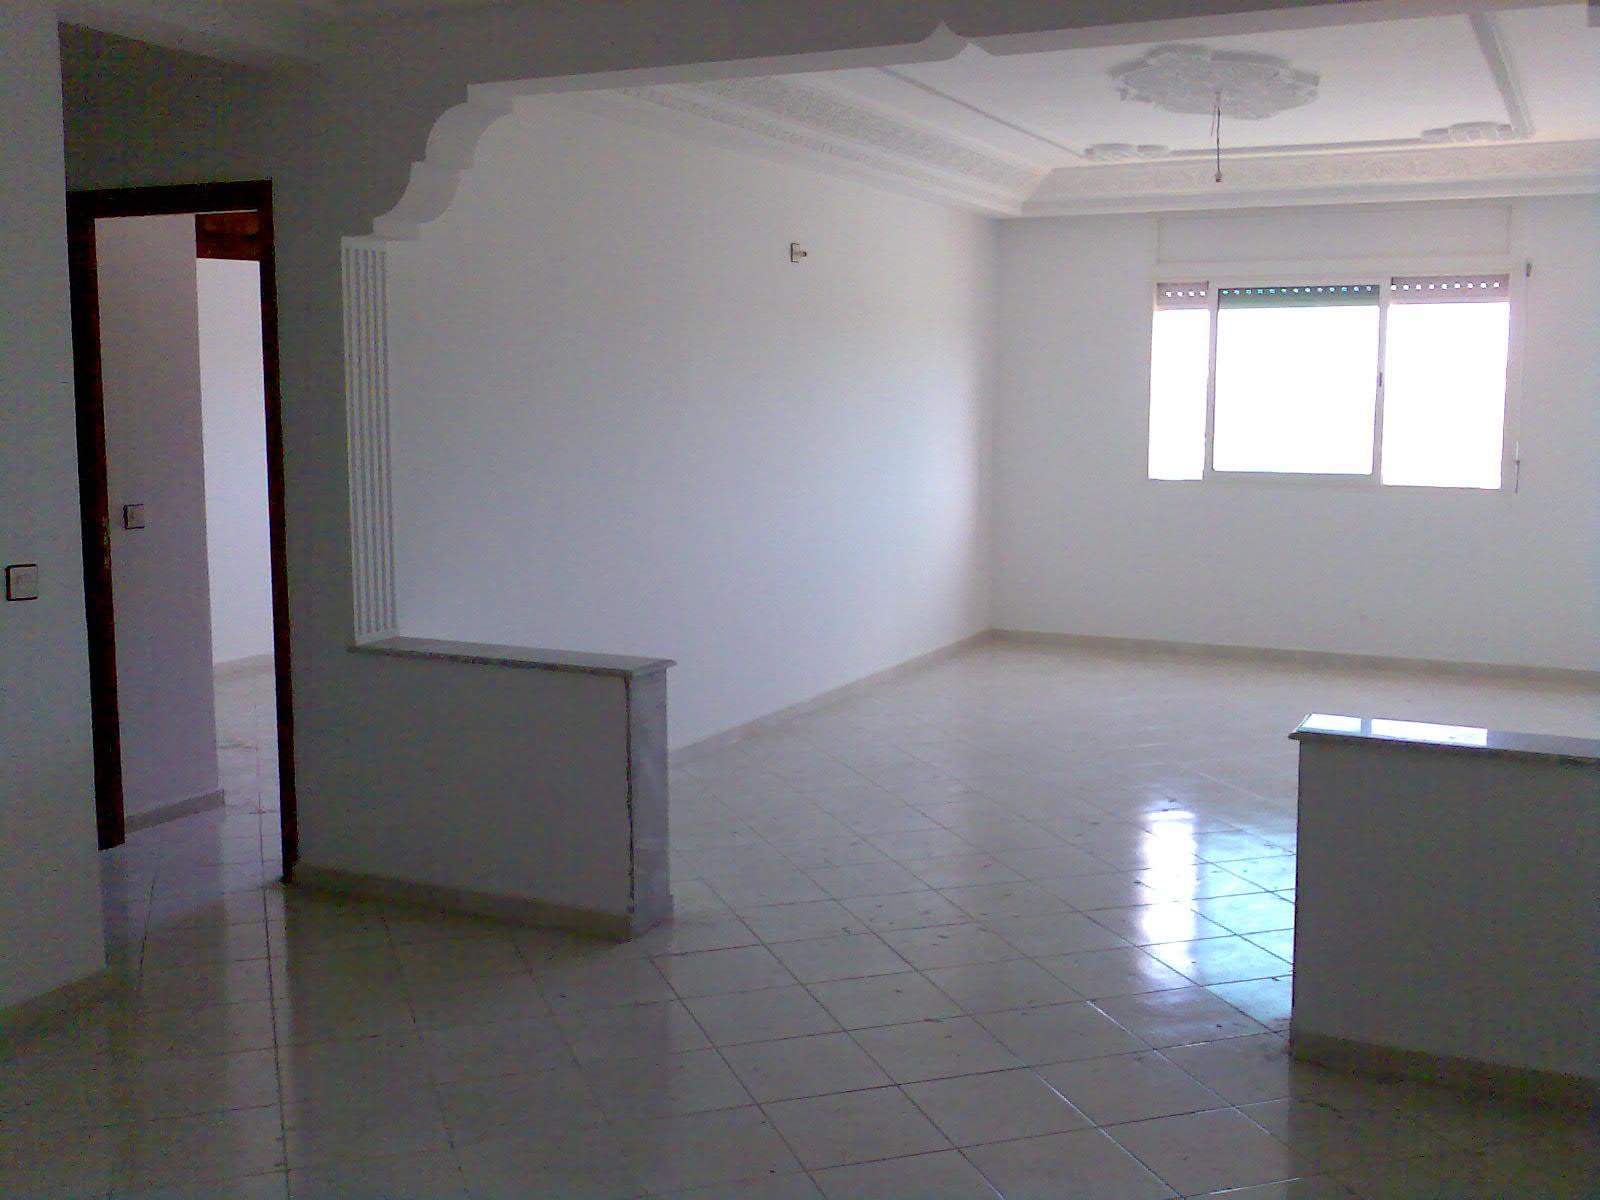 Immobilier à Kenitra Maroc neuf Immobilier à Kenitra pas